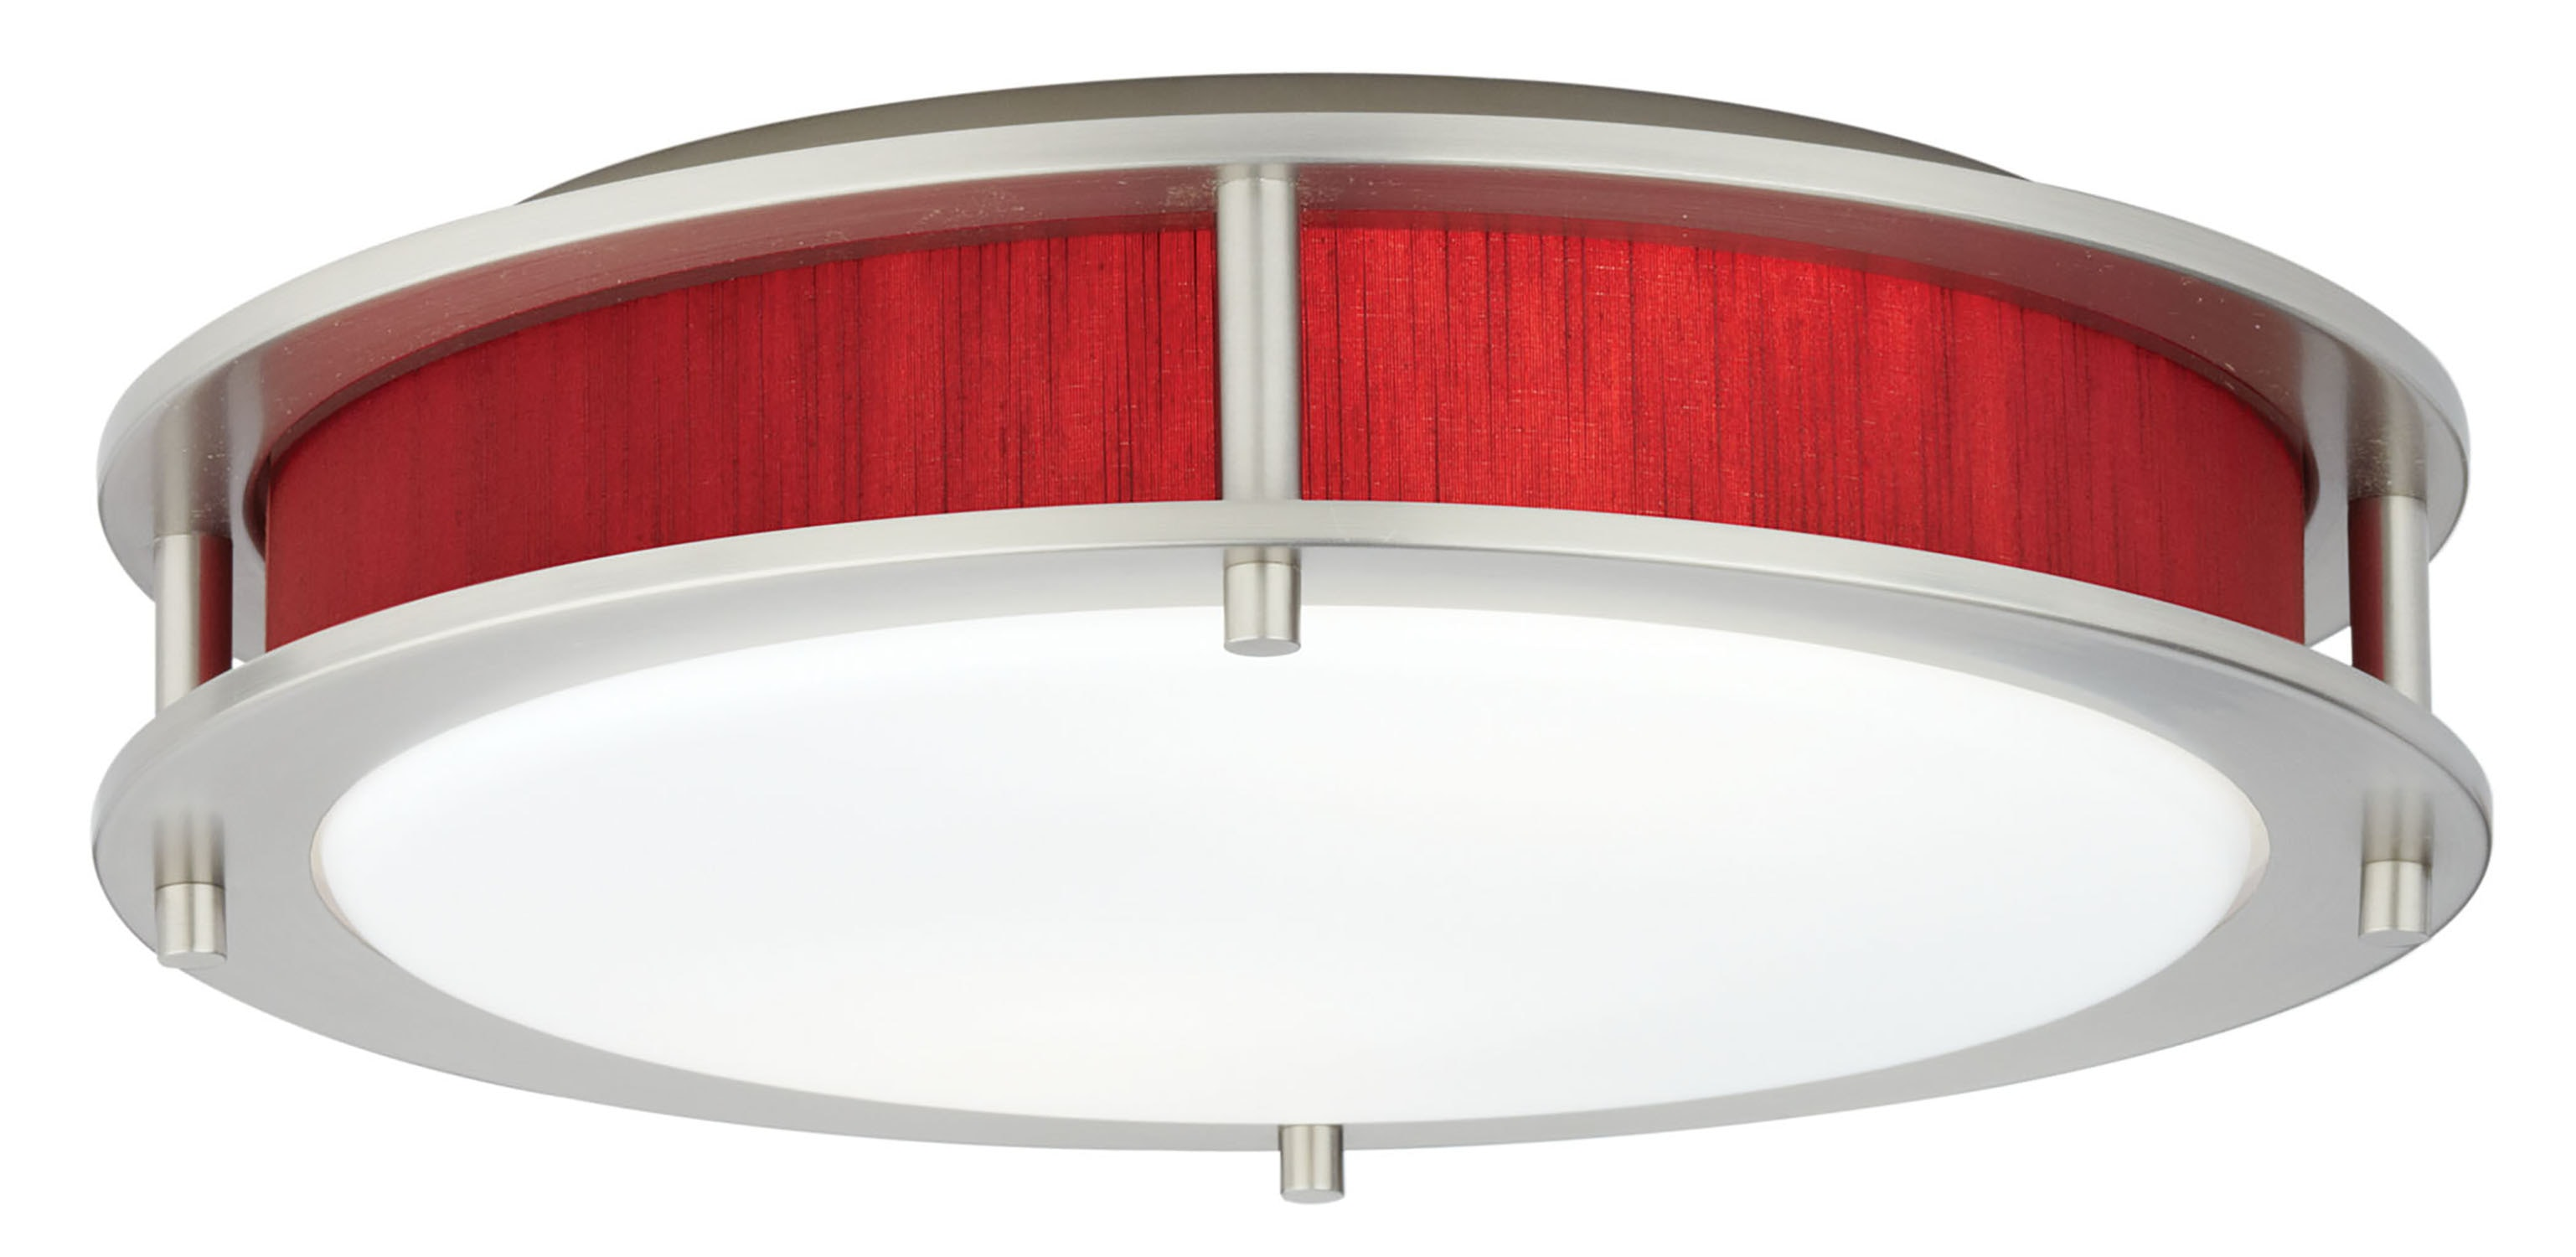 Satin Nickel / Indoor / 2 Beautility Satin Nickel 2-Light Semi-Flush with Tomato Red Fabric 0